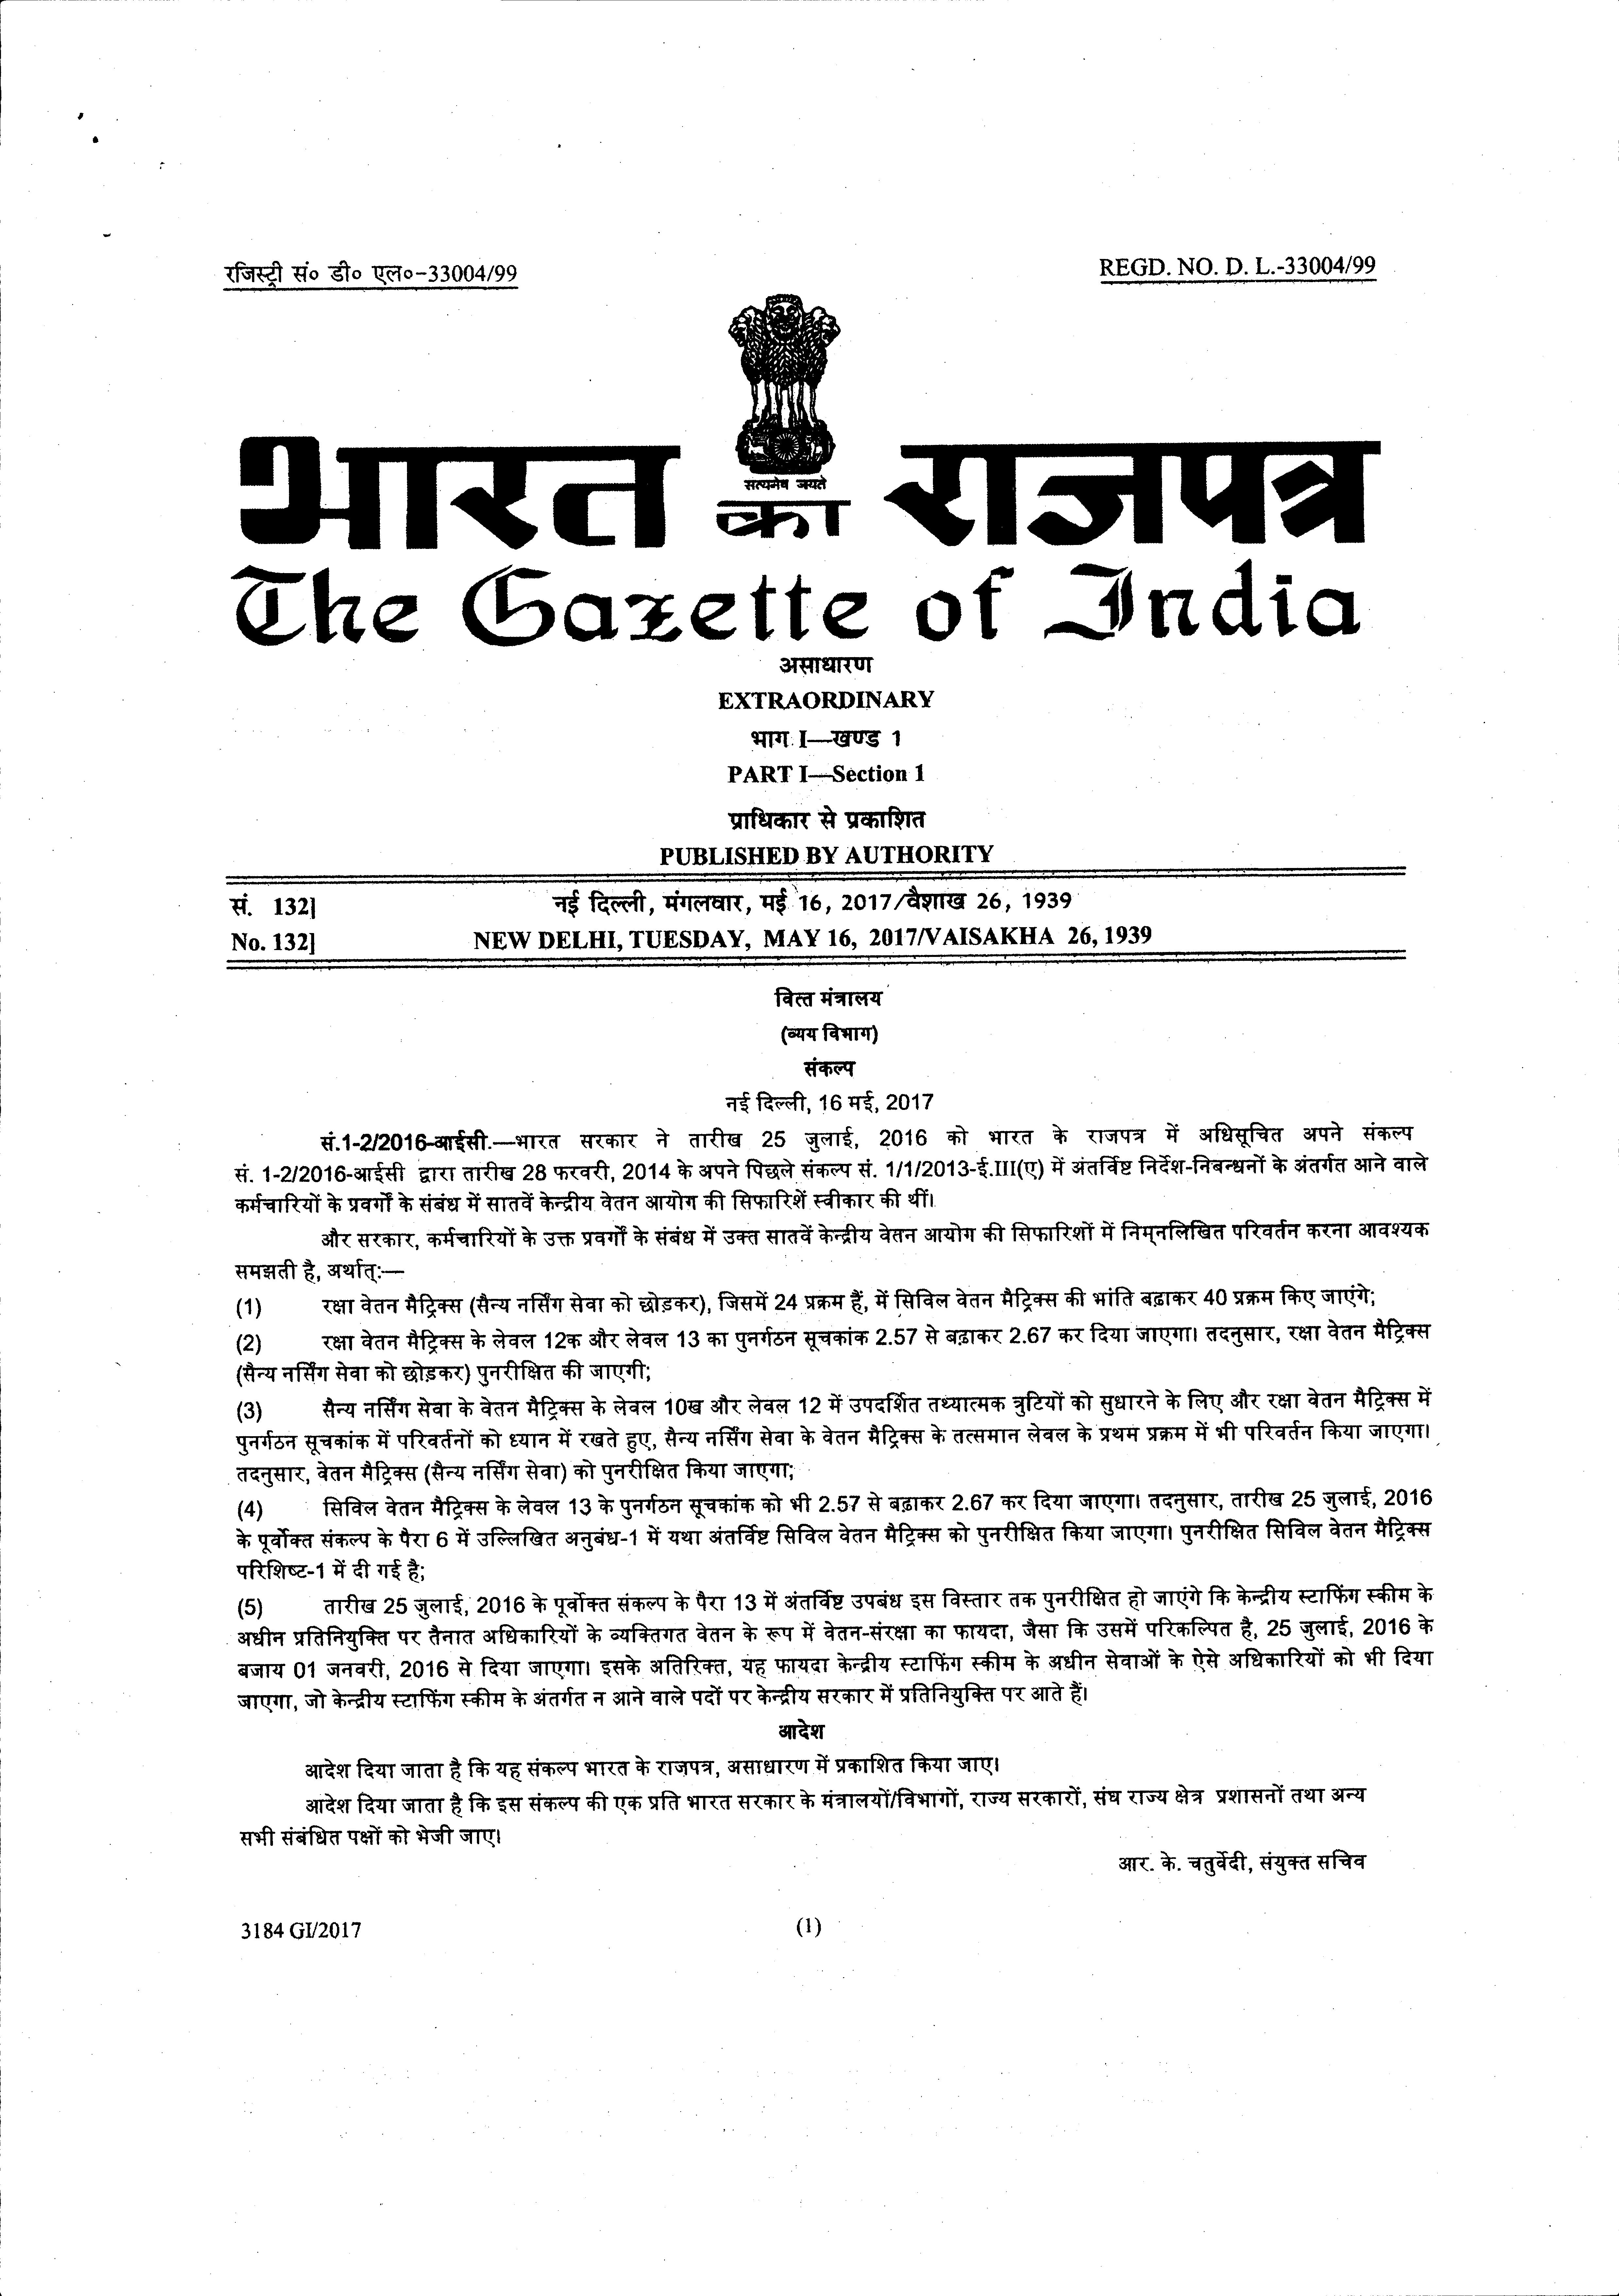 CGDA circular on 7th cpc implementation